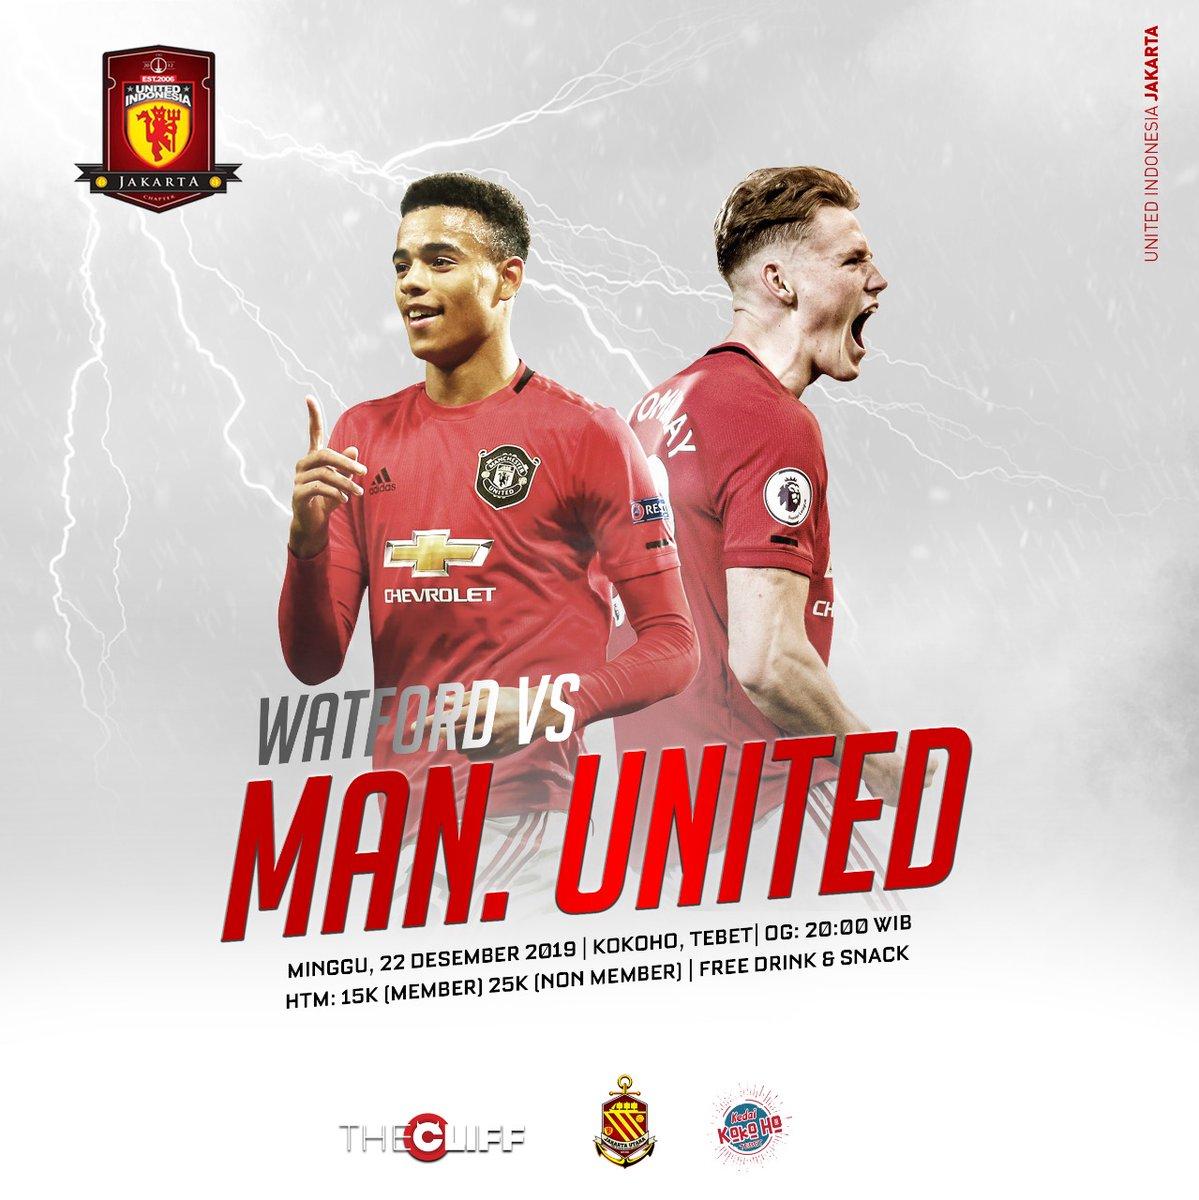 #LiveScreening Watford vs Manchester United, Besok! Di kedai Kokoho Tebet, Open Gate: 20.00, Htm? 15k member dan 20k untuk non member!   #UIJKT https://t.co/TQZB8Z764A